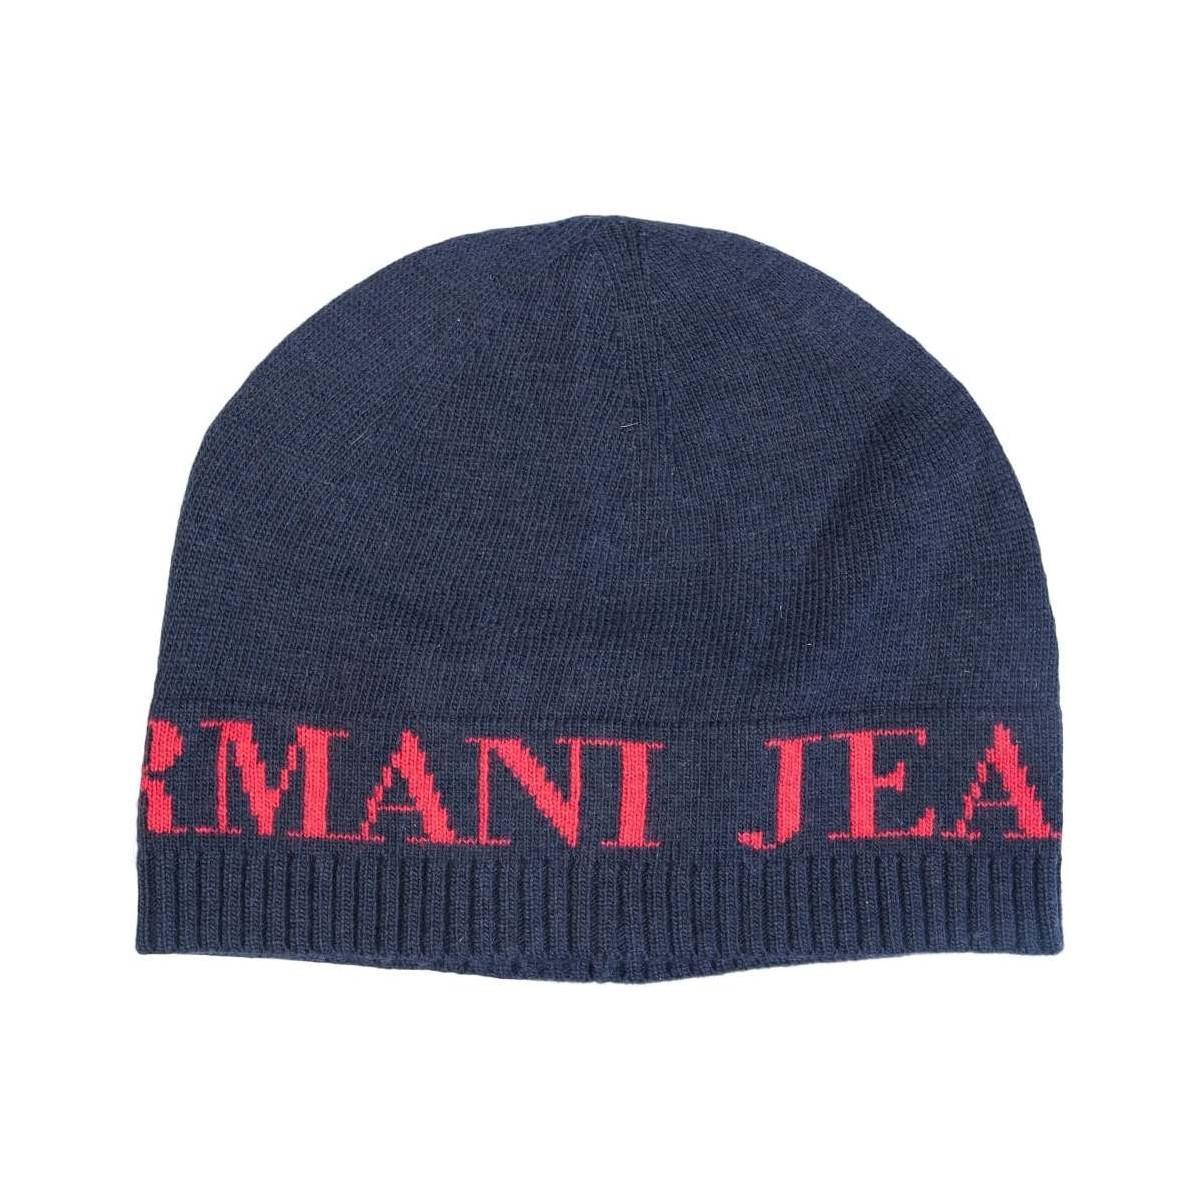 31055f7b5da Armani Jeans. Gift Set Hat And Scarf 937503 Cc783 Men s Beanie In Blue